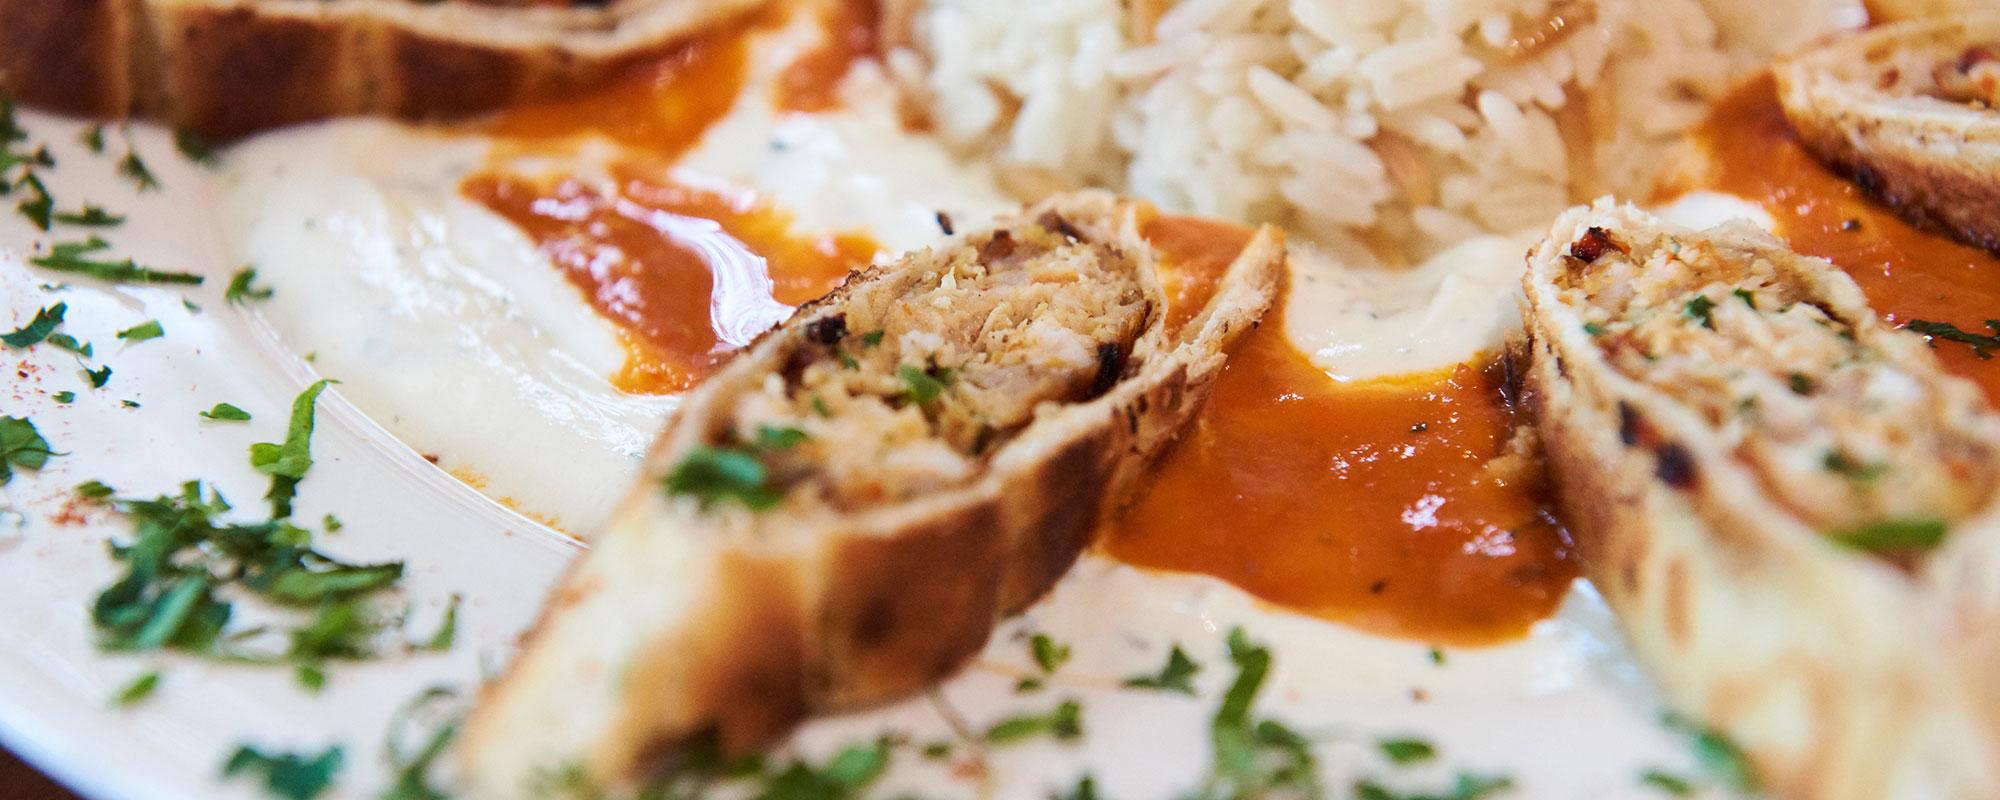 Liman restaurant image of Mediterranean food